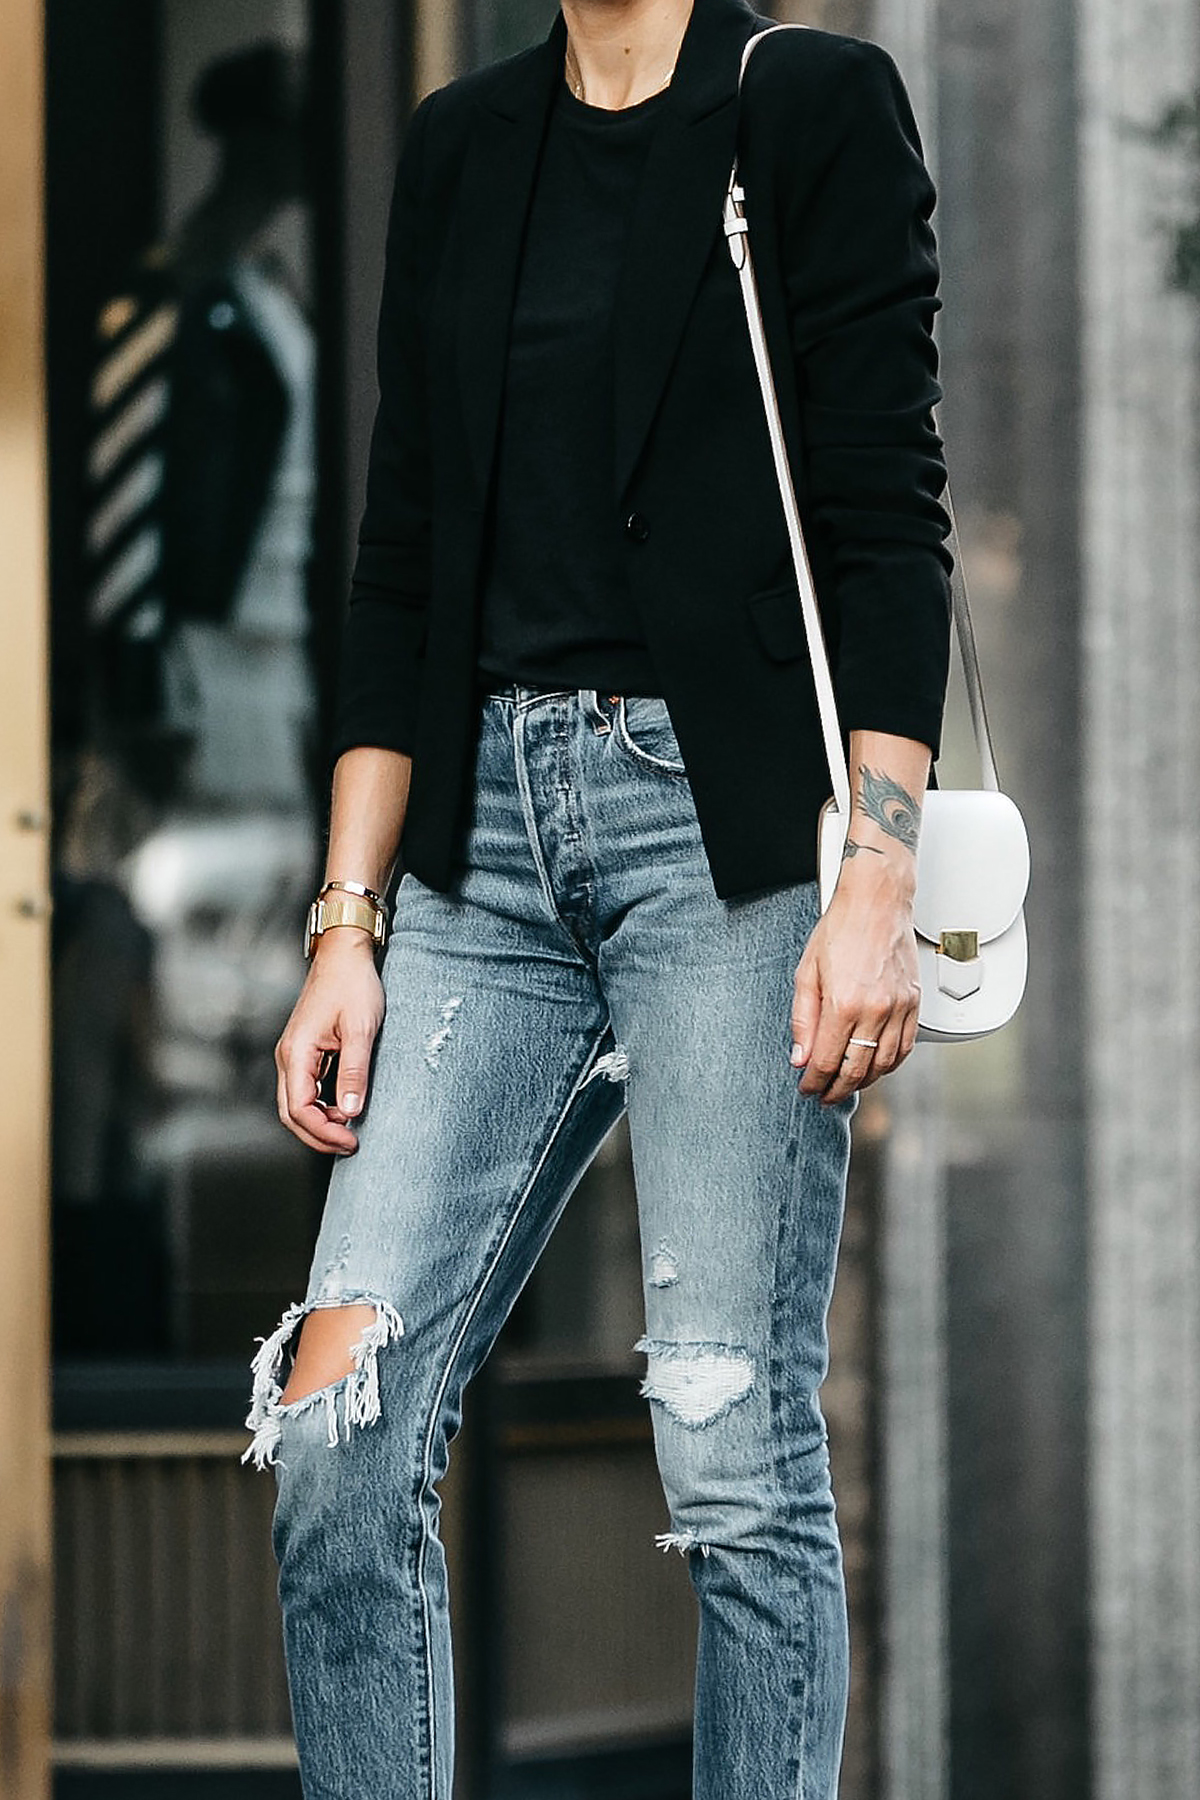 Black Blazer Black Tshirt Levis Ripped Denim Jeans Outfit Celine Trotteur White Handbag Fashion Jackson Dallas Blogger Fashion Blogger Street Style